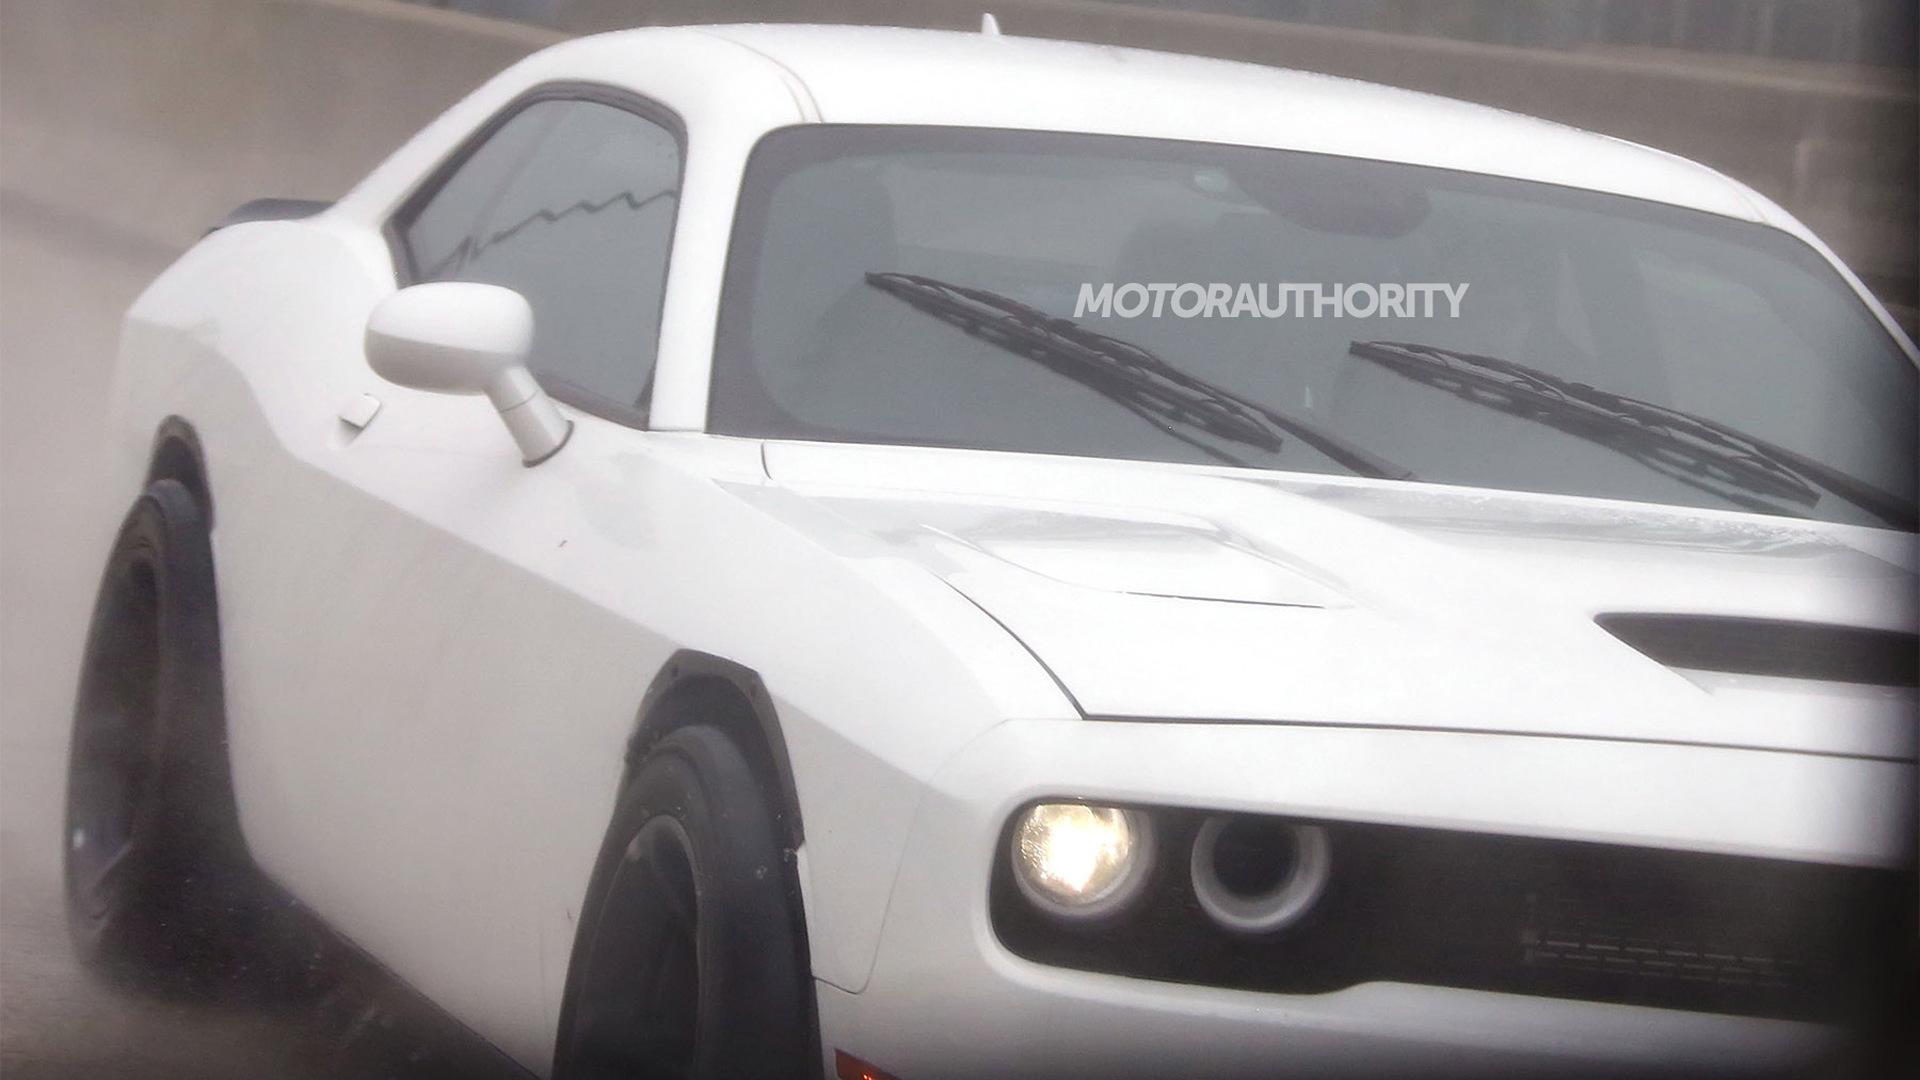 2018 Dodge Challenger ADR (wide-body SRT Hellcat) spy shots - Image via S. Baldauf/SB-Medien